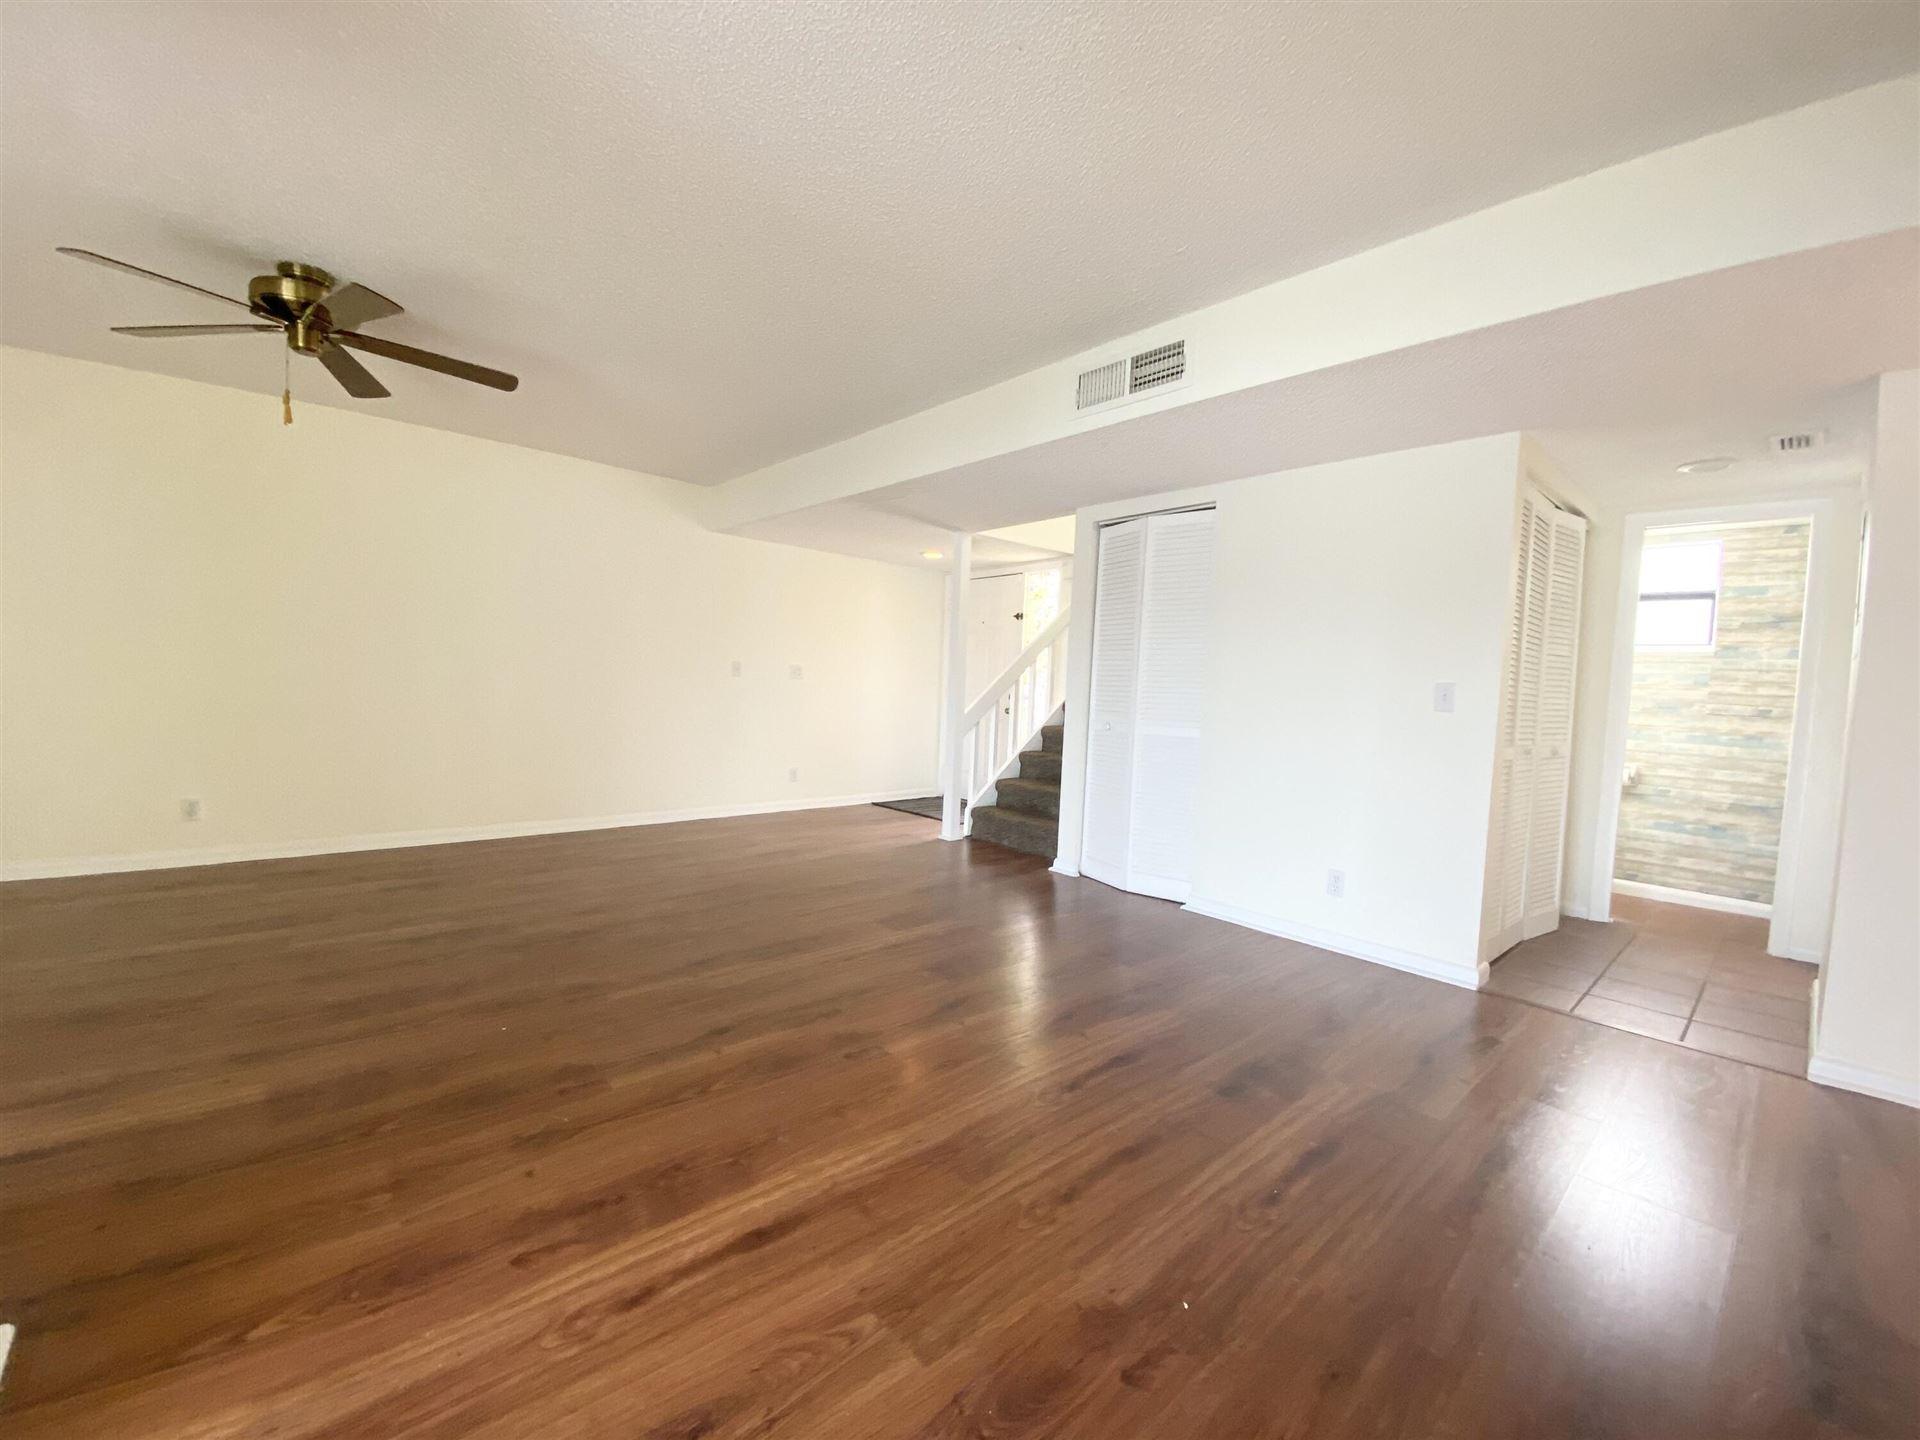 Photo of 703 Stonewood Court #16a, Jupiter, FL 33458 (MLS # RX-10734013)